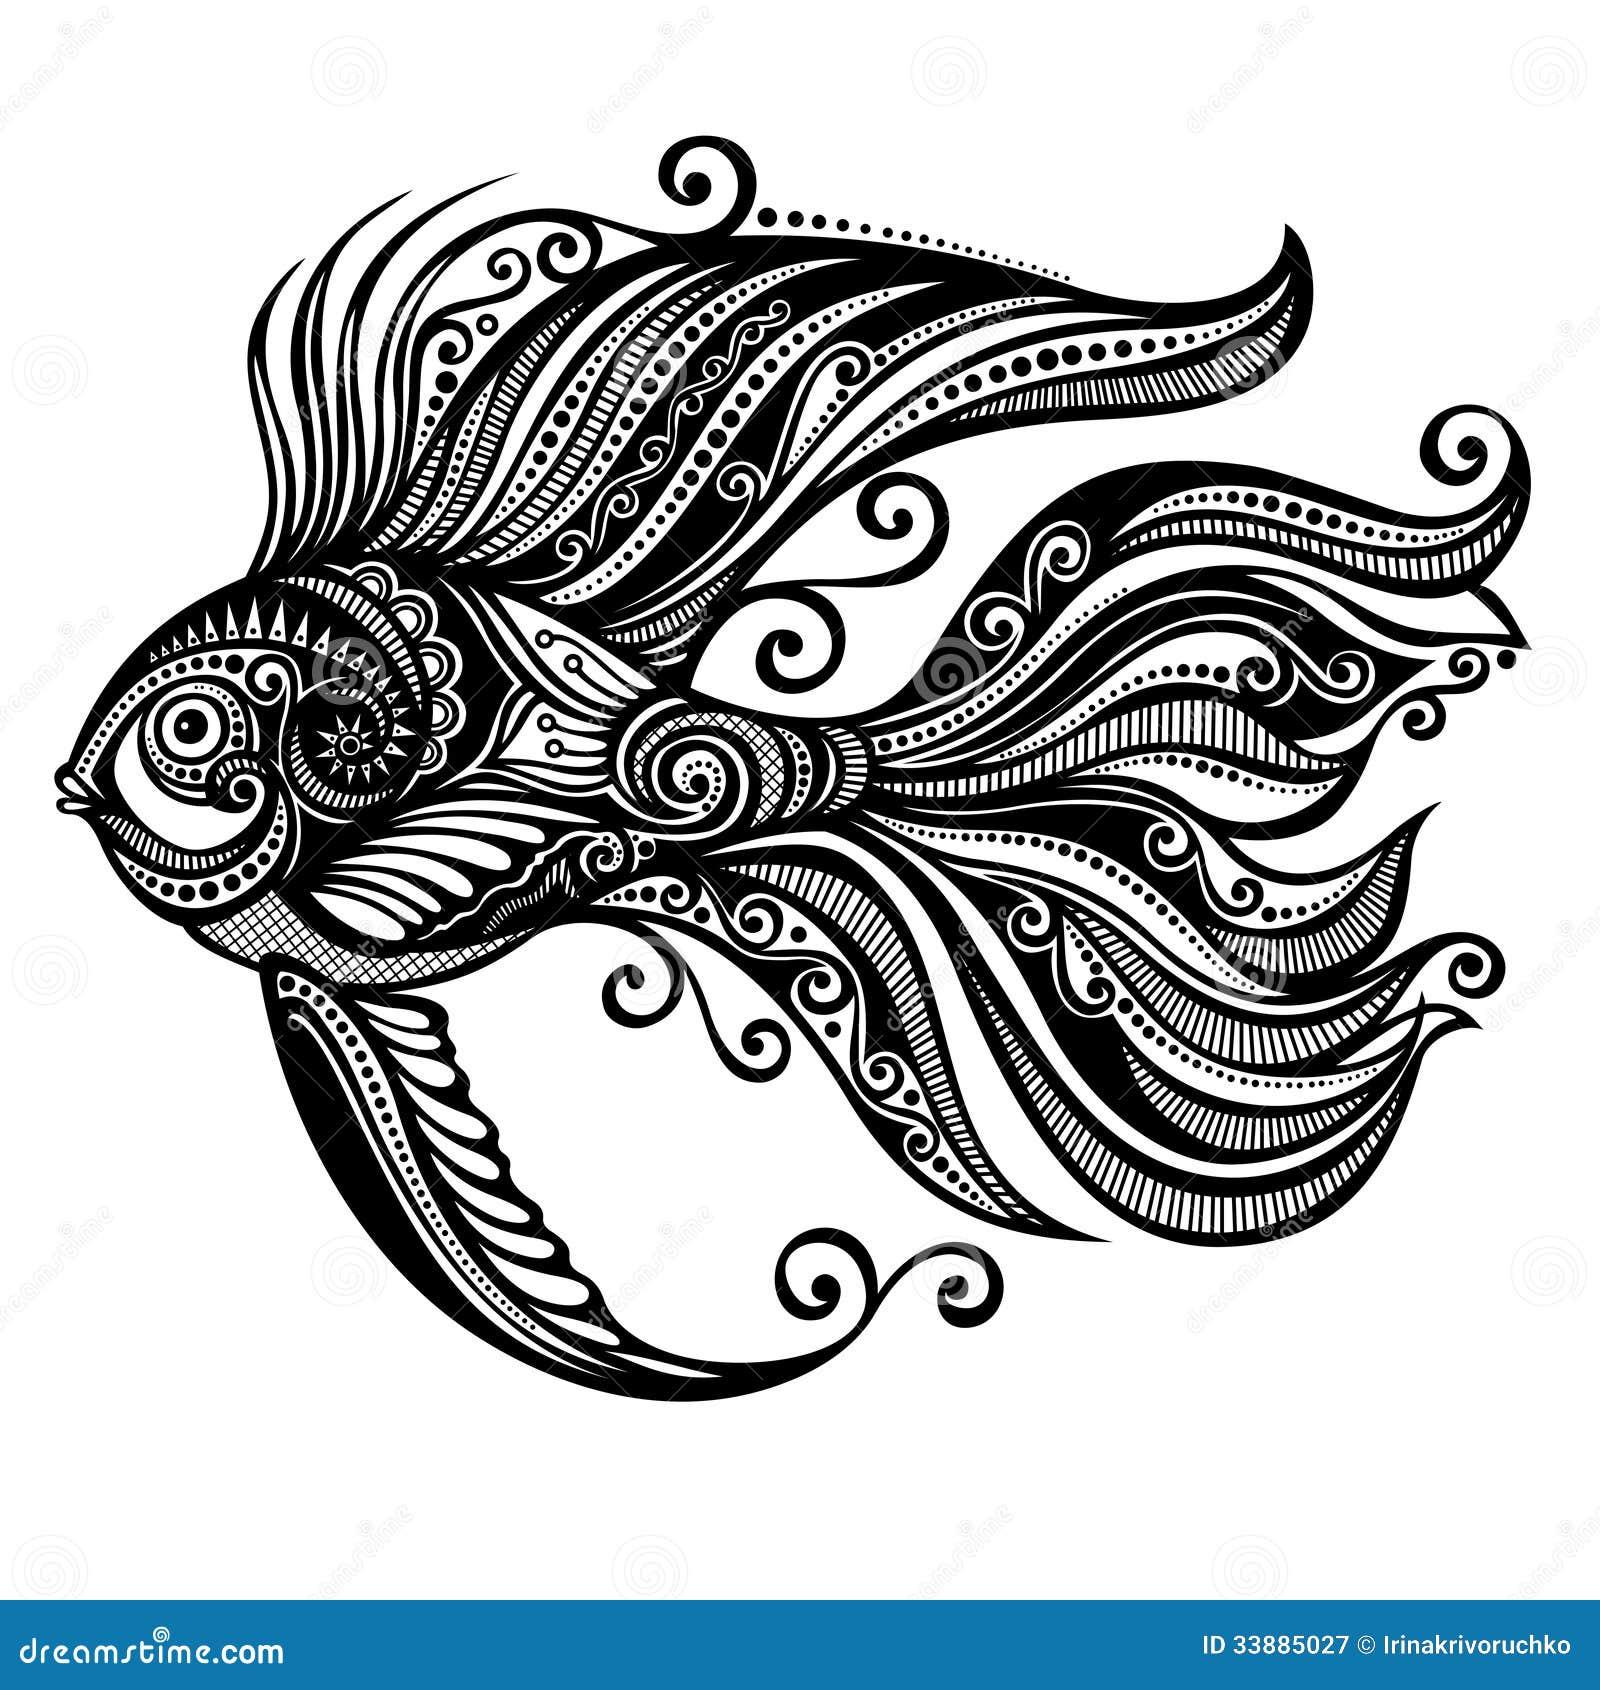 Abstract fish designs - photo#4